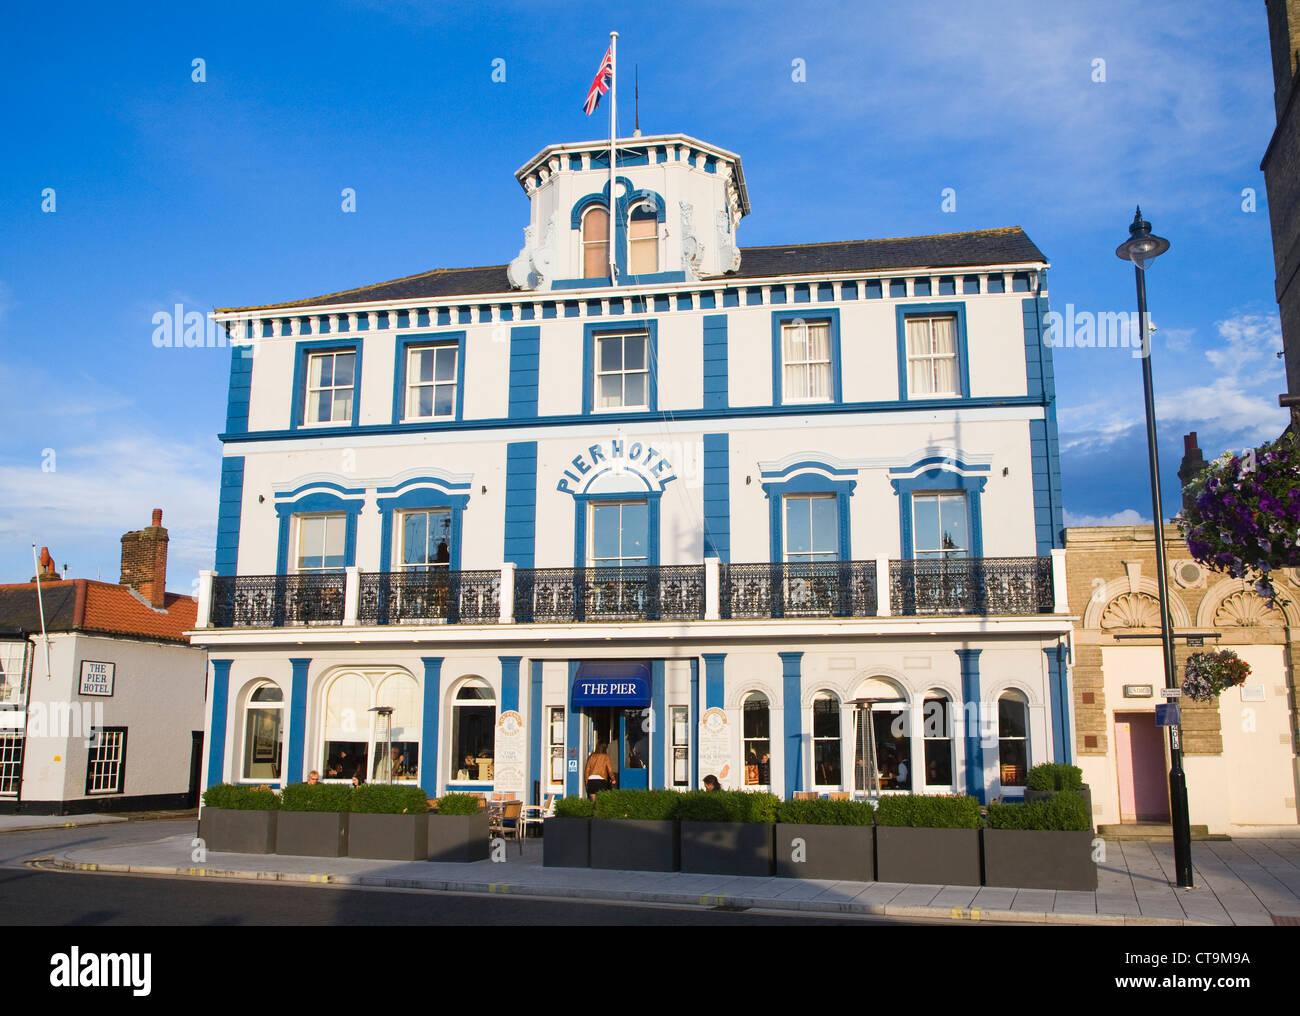 Pier hotel Harwich Essex England - Stock Image